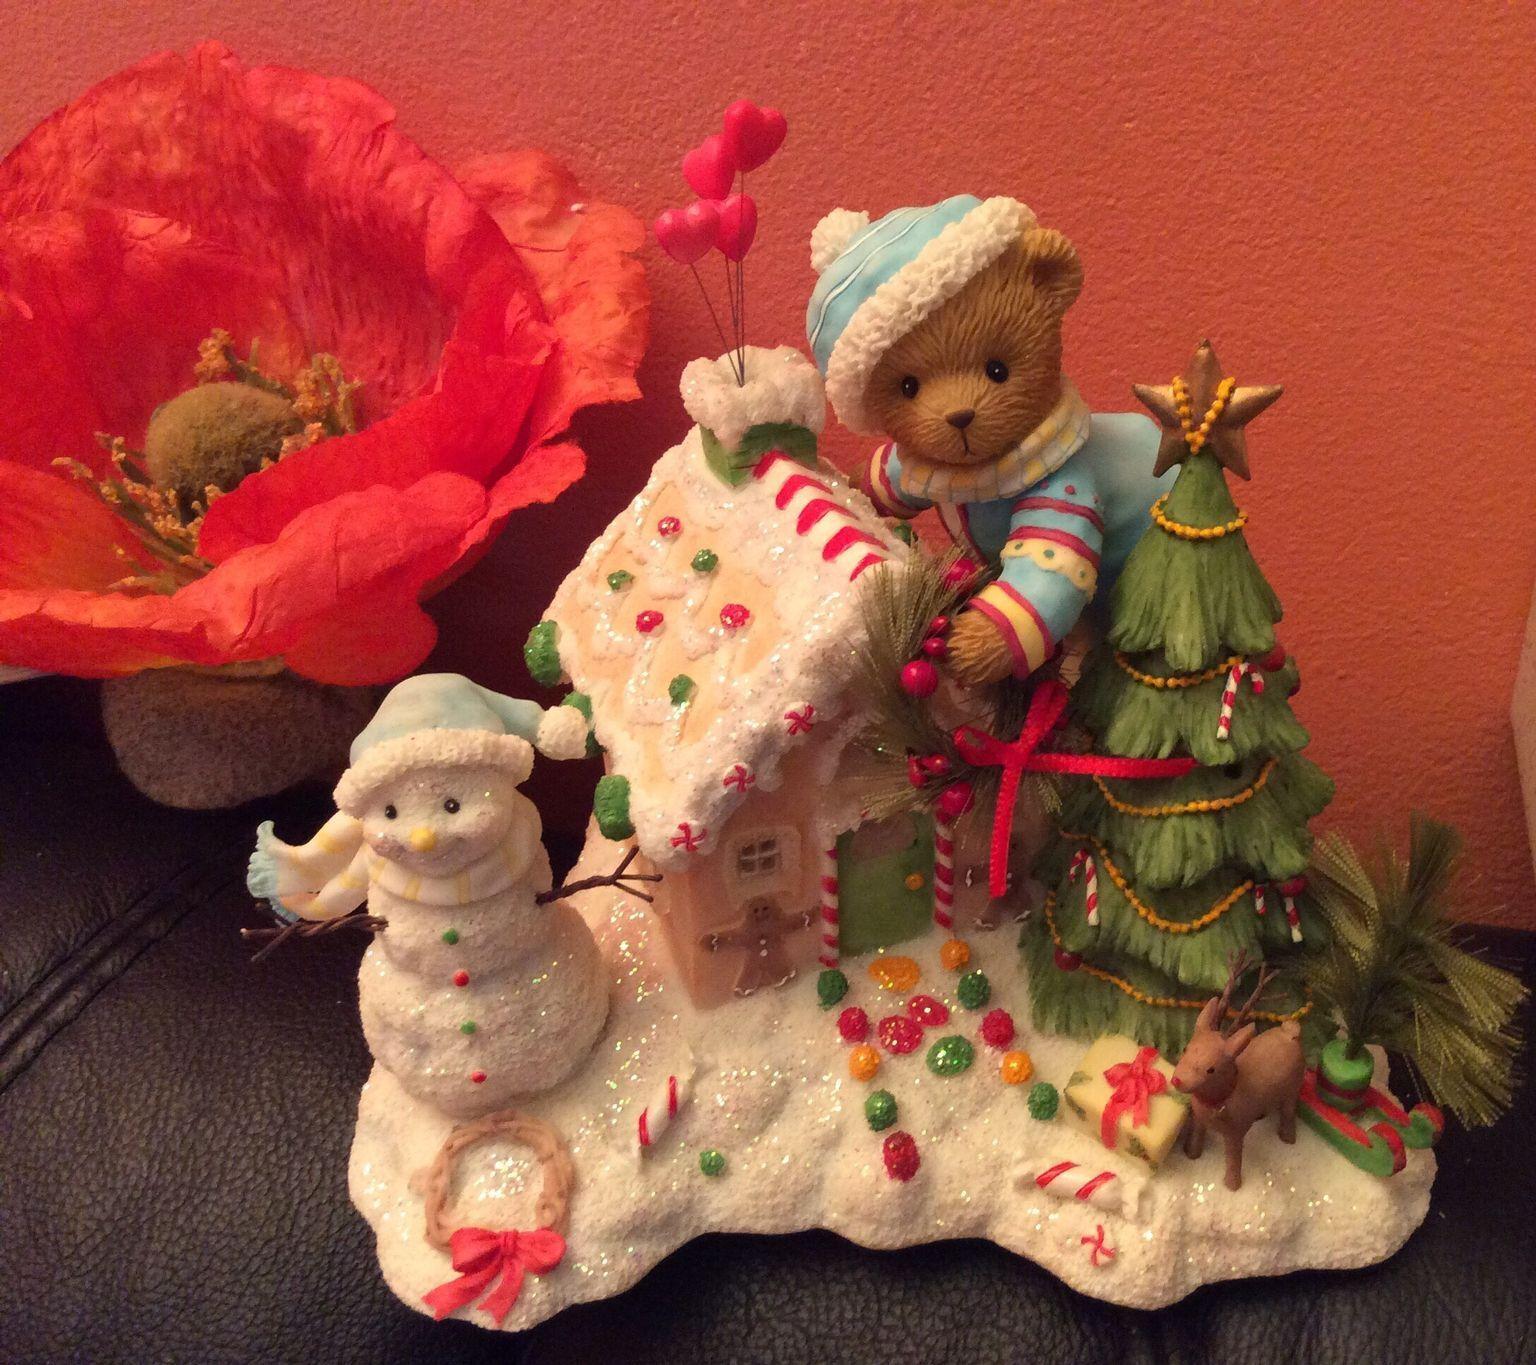 Cherished Teddies Anders Anders Anders Bear Decorating Gingerbread House Musical Neu und OVP 725a72